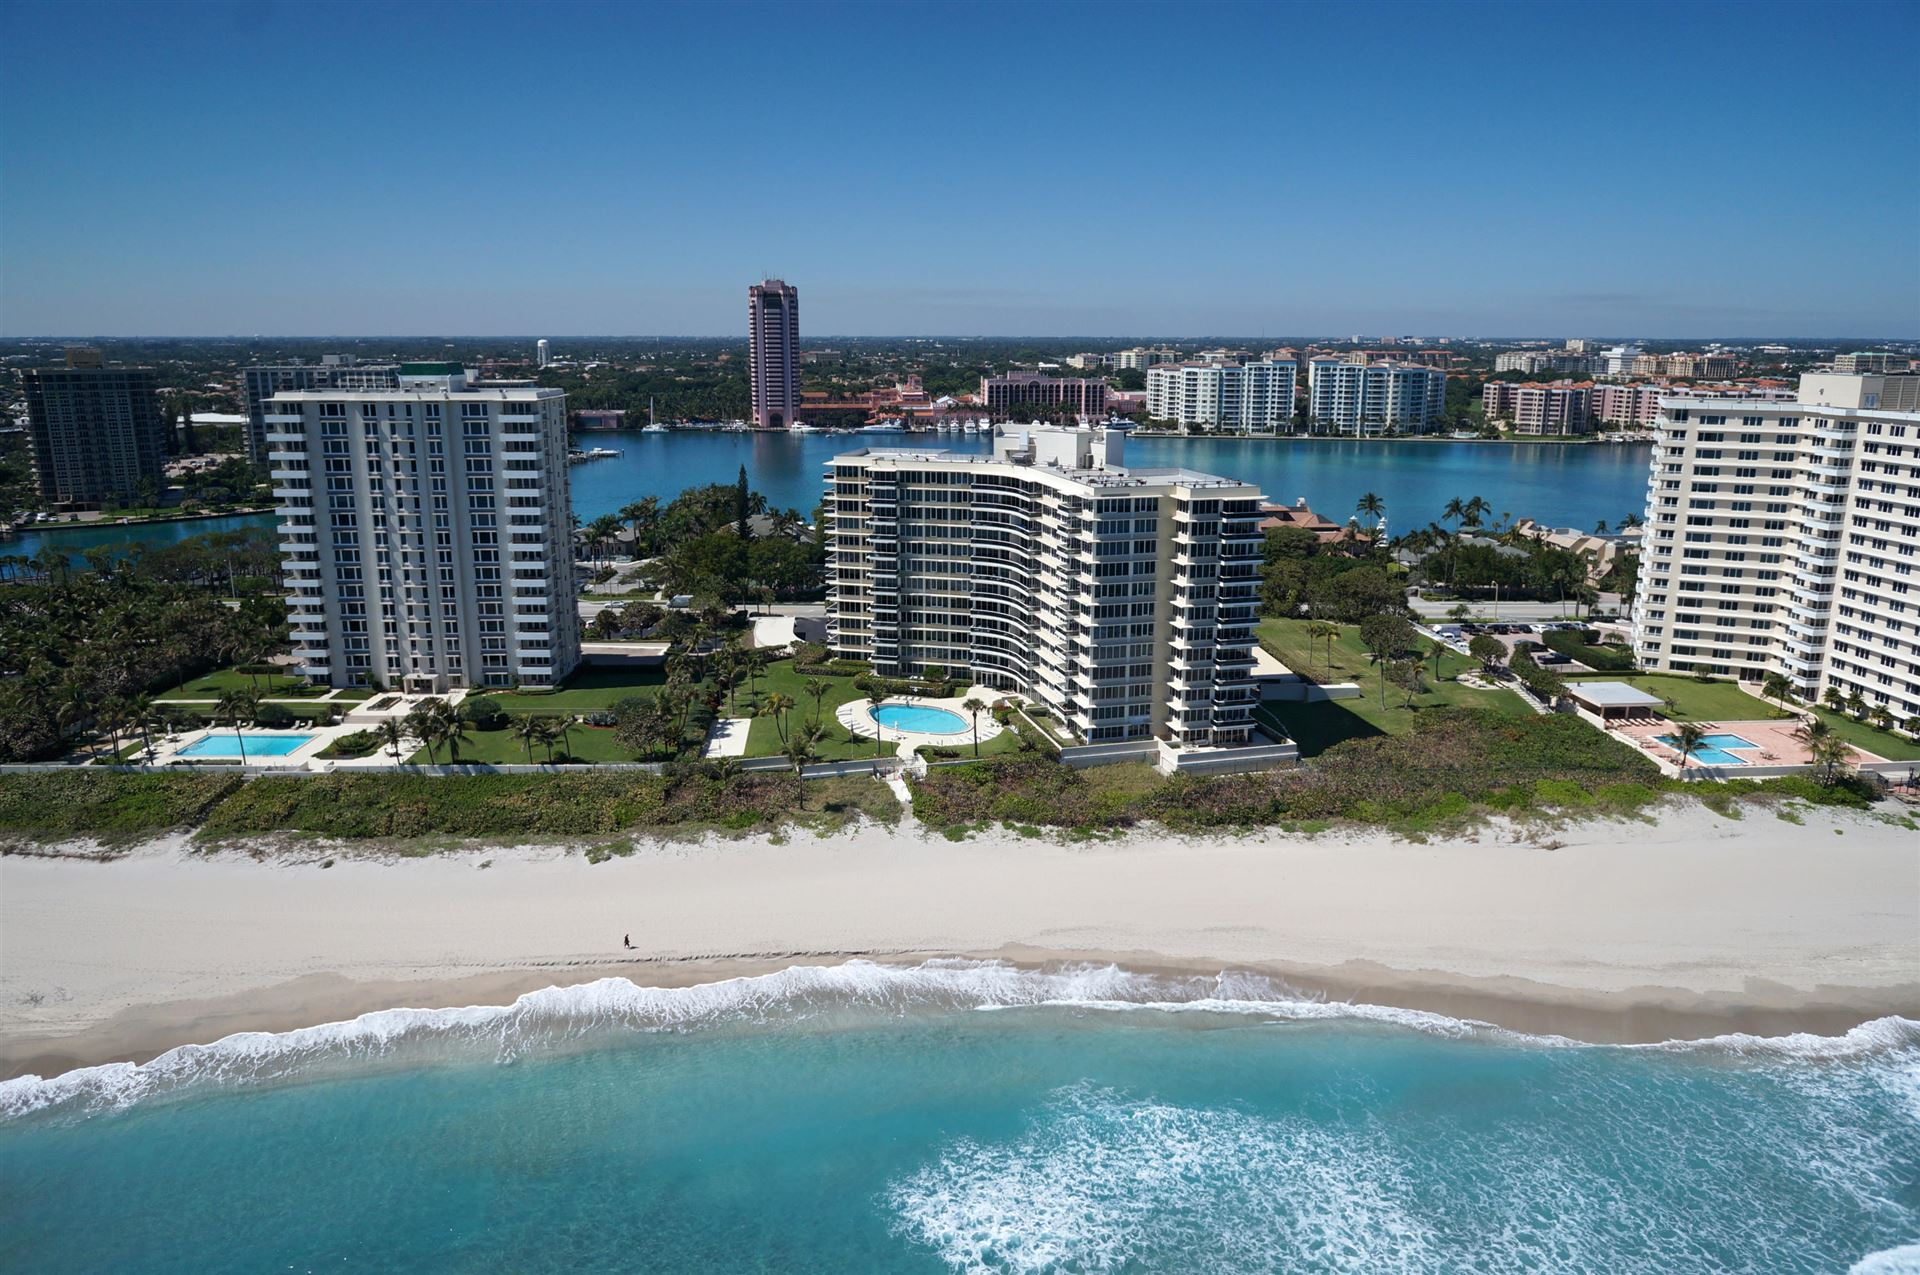 700 S Ocean Boulevard #802&S2, Boca Raton, FL 33432 - #: RX-10623451